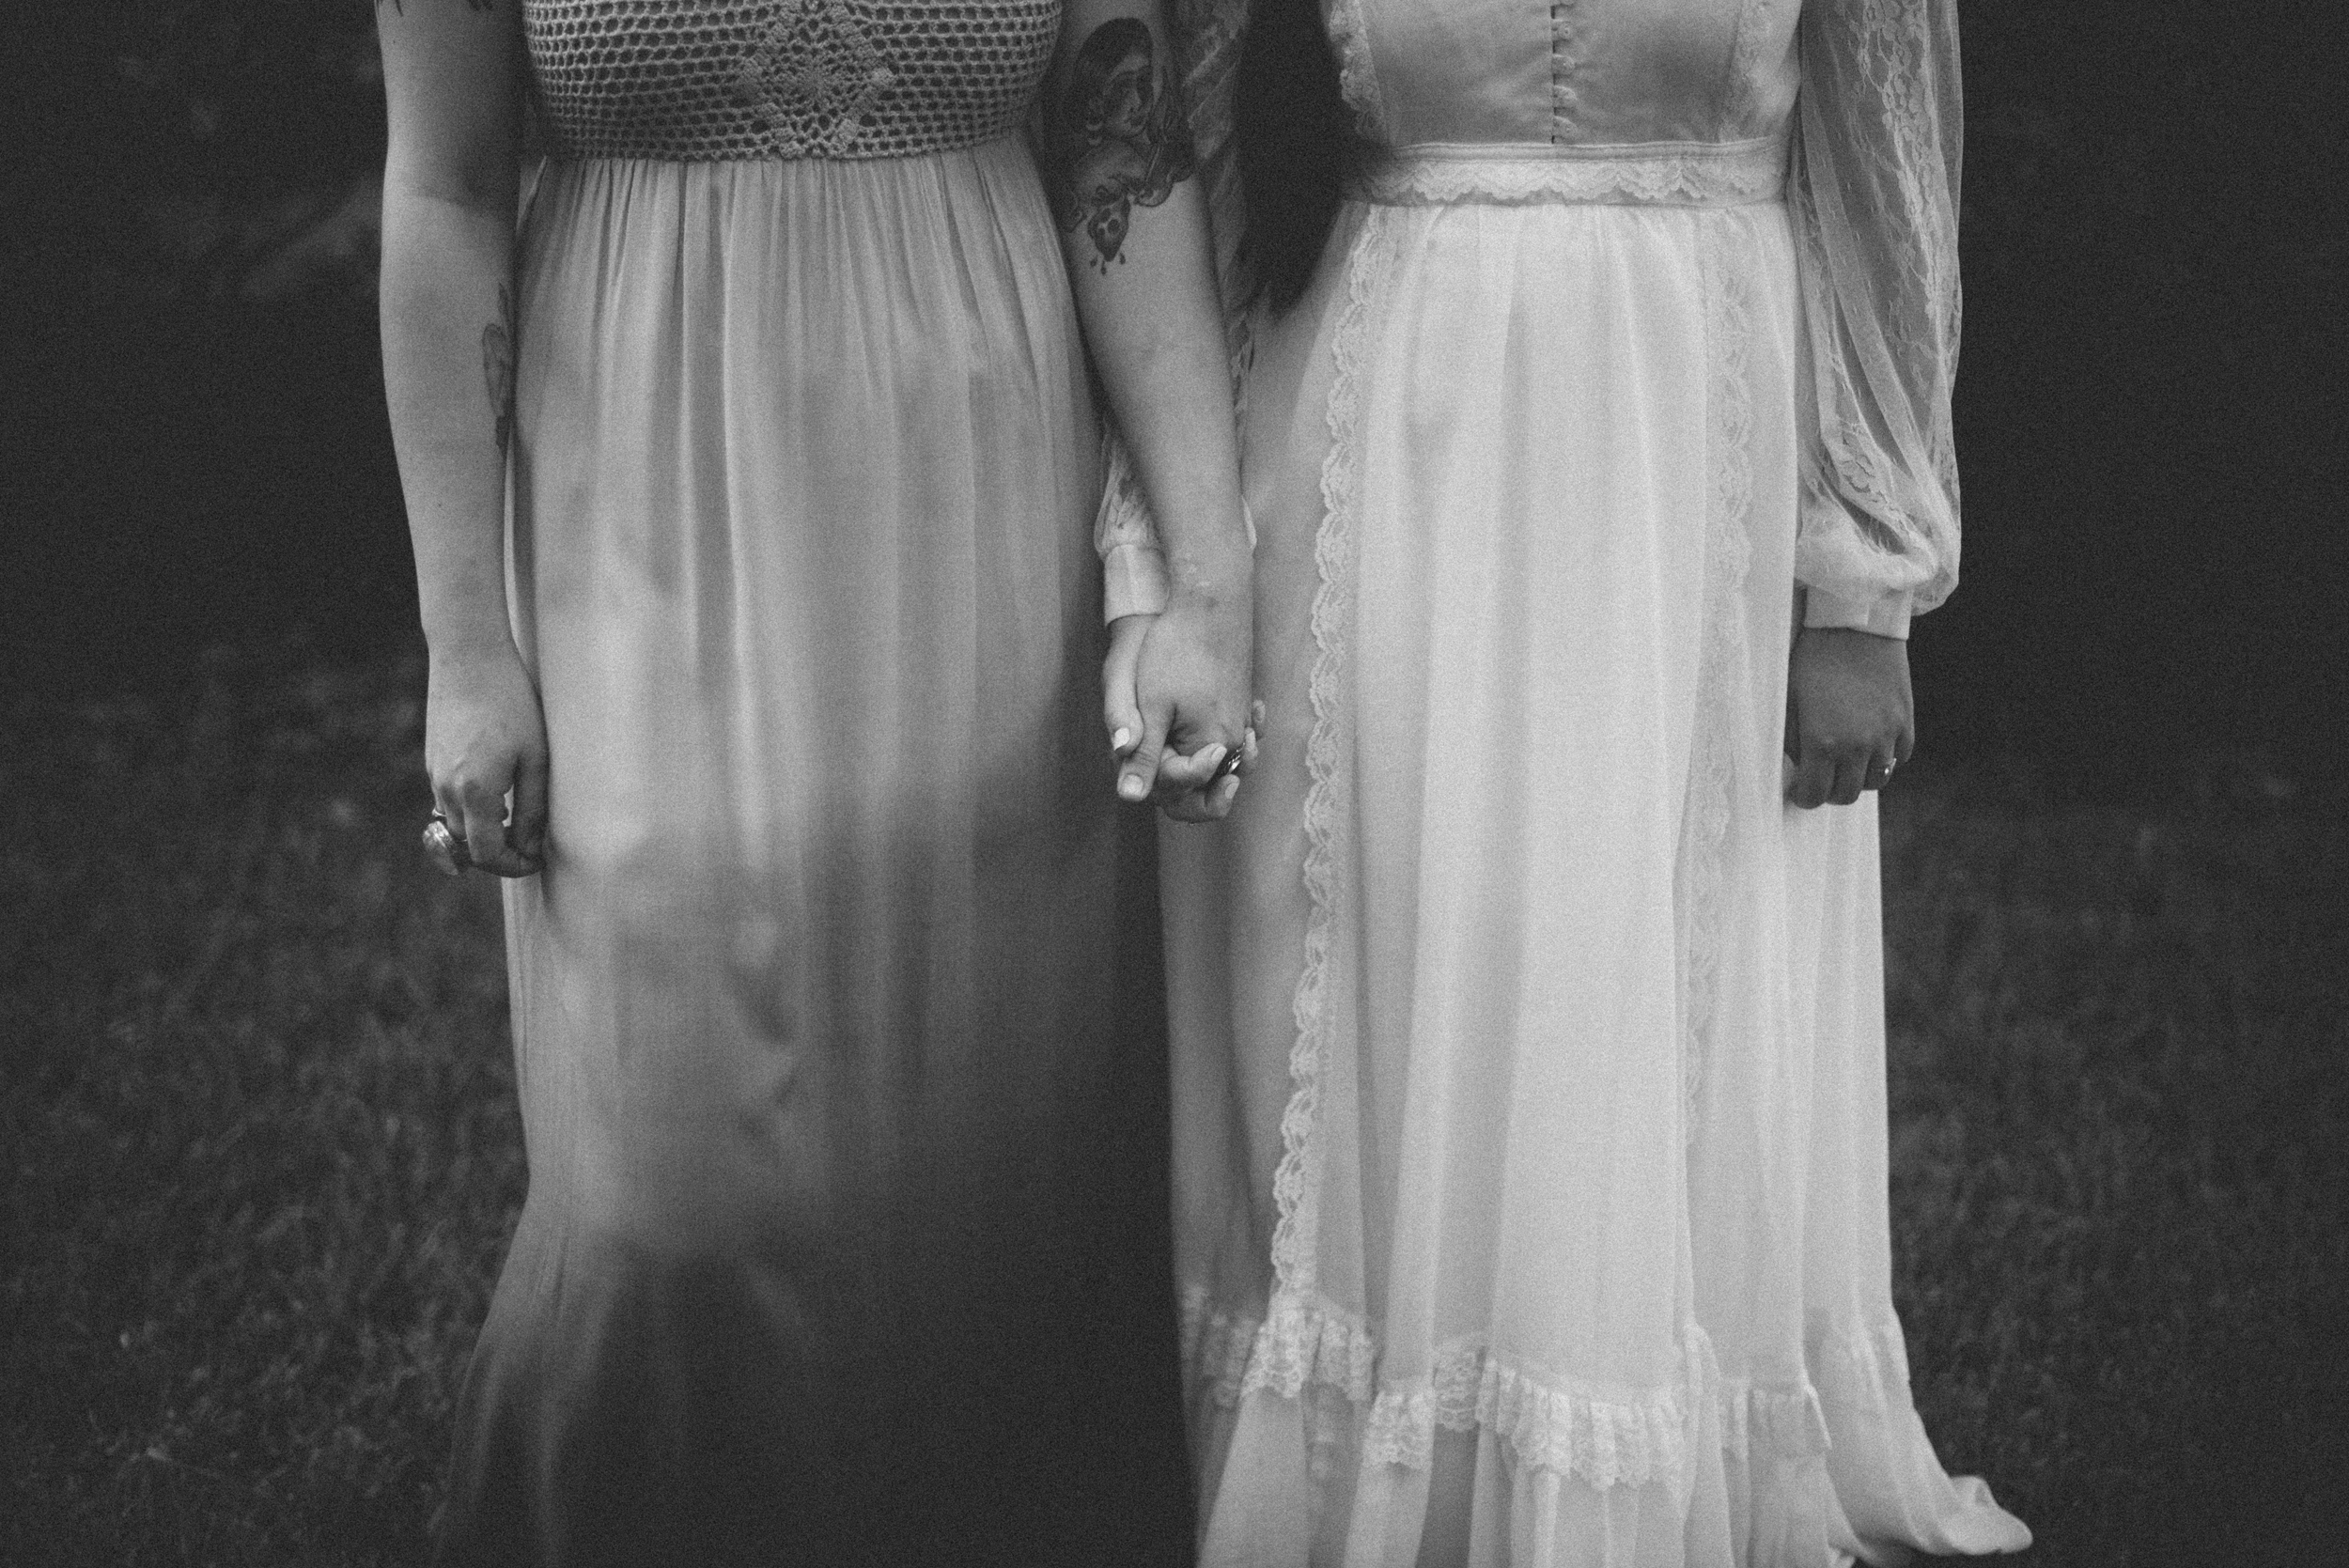 ofRen_weddingphotographer-109.jpg